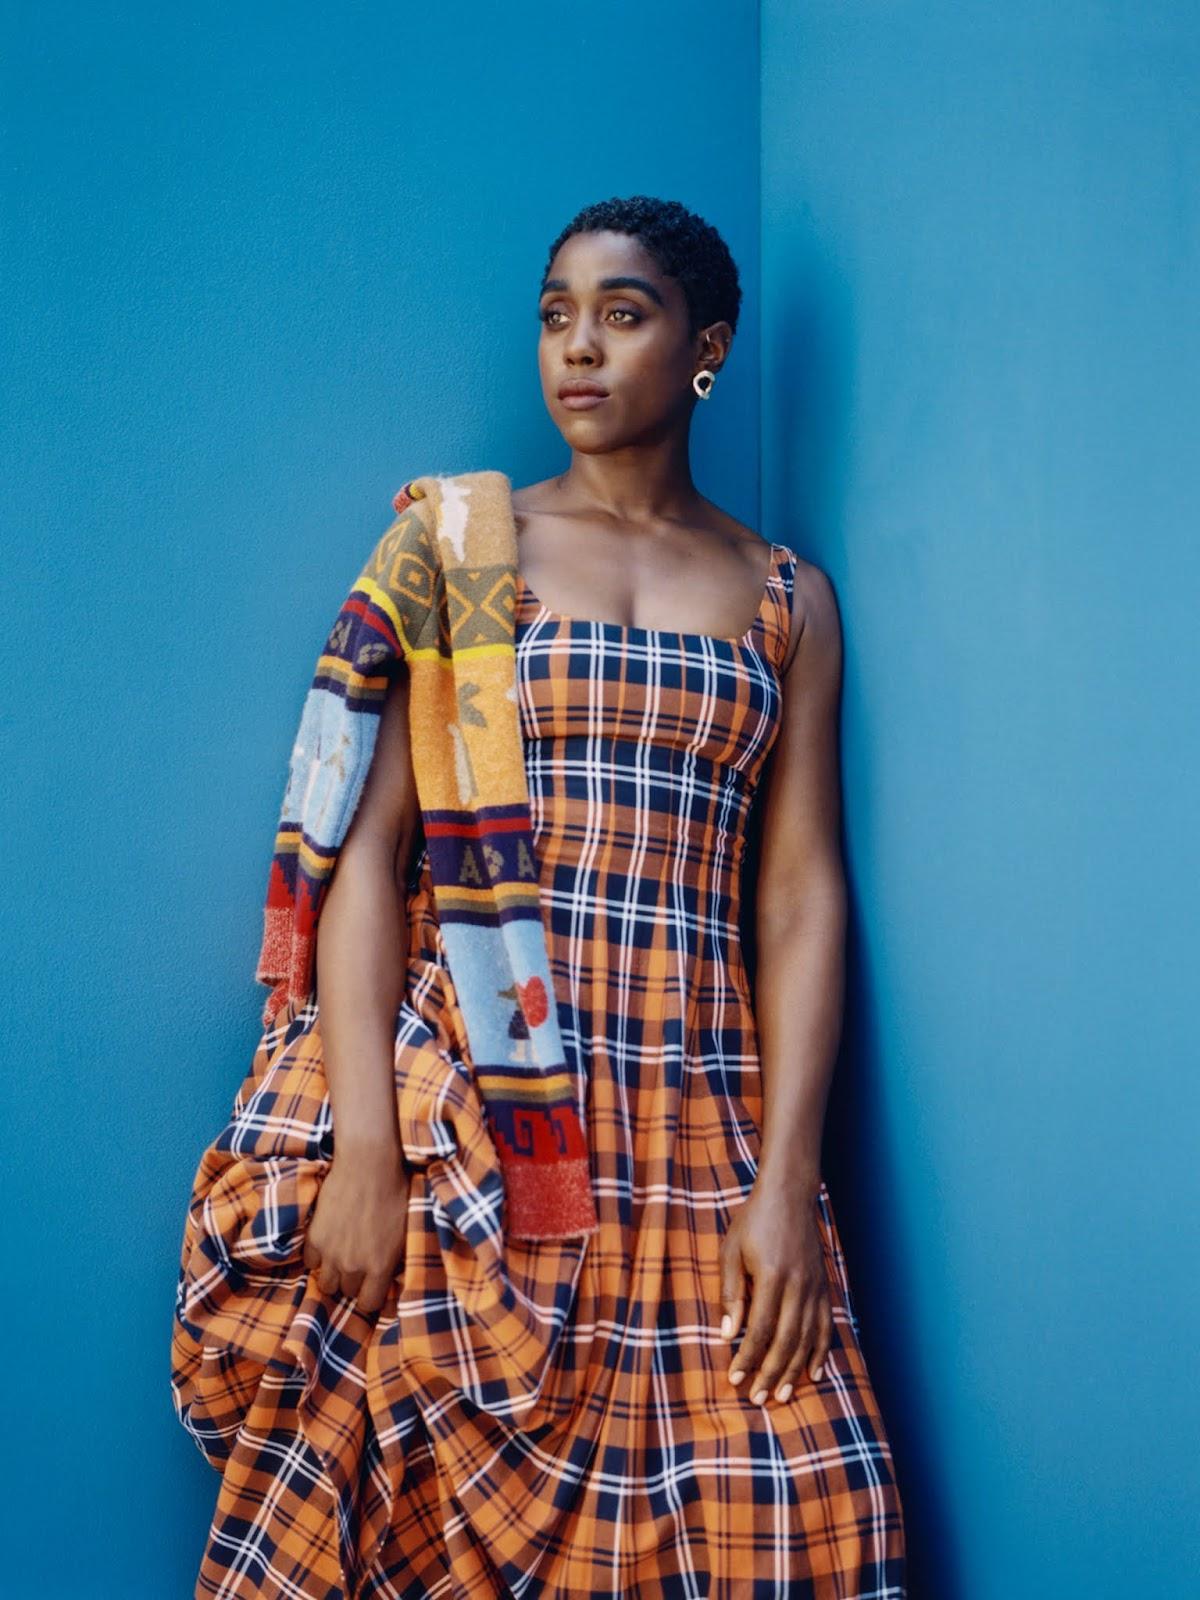 SMILE: Lashana Lynch in Porter Edit 4th October 2021 by Kennedi Carter